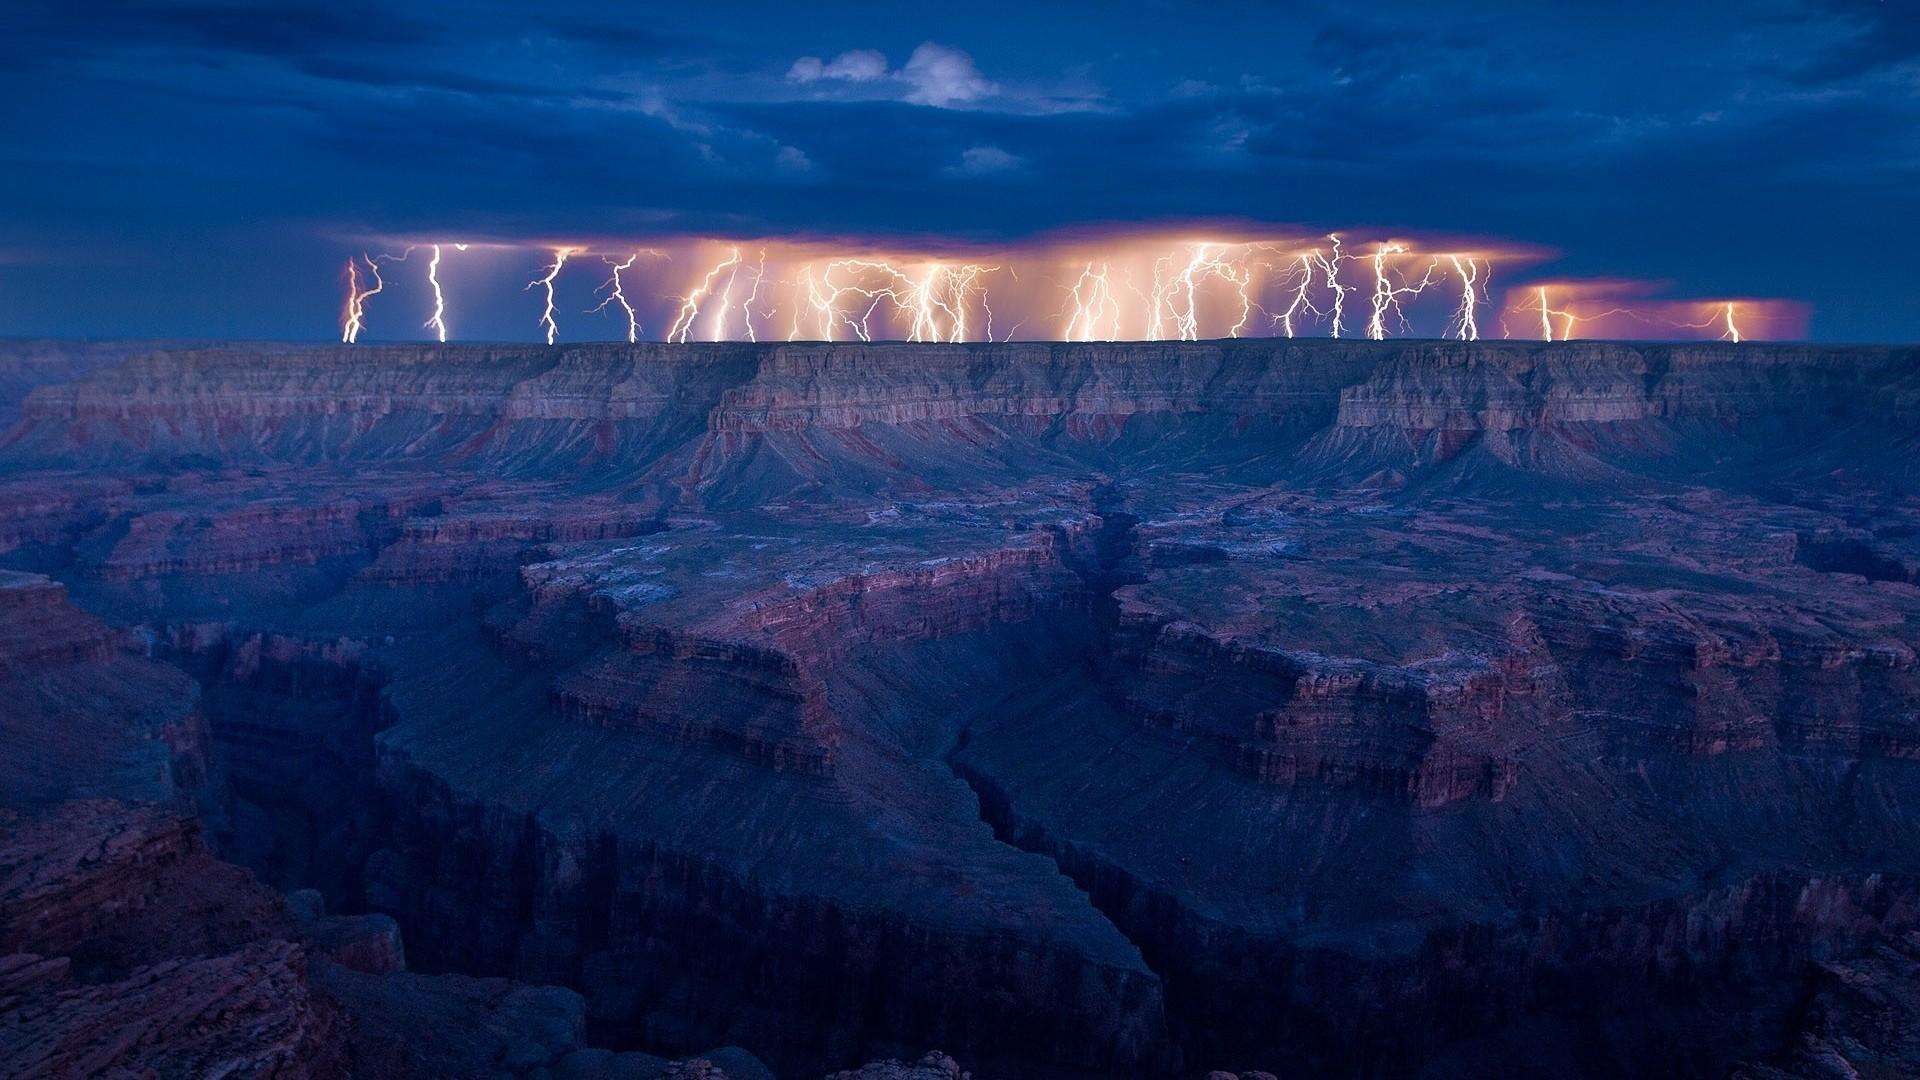 Lightning Bolt Backgrounds 1920×1080